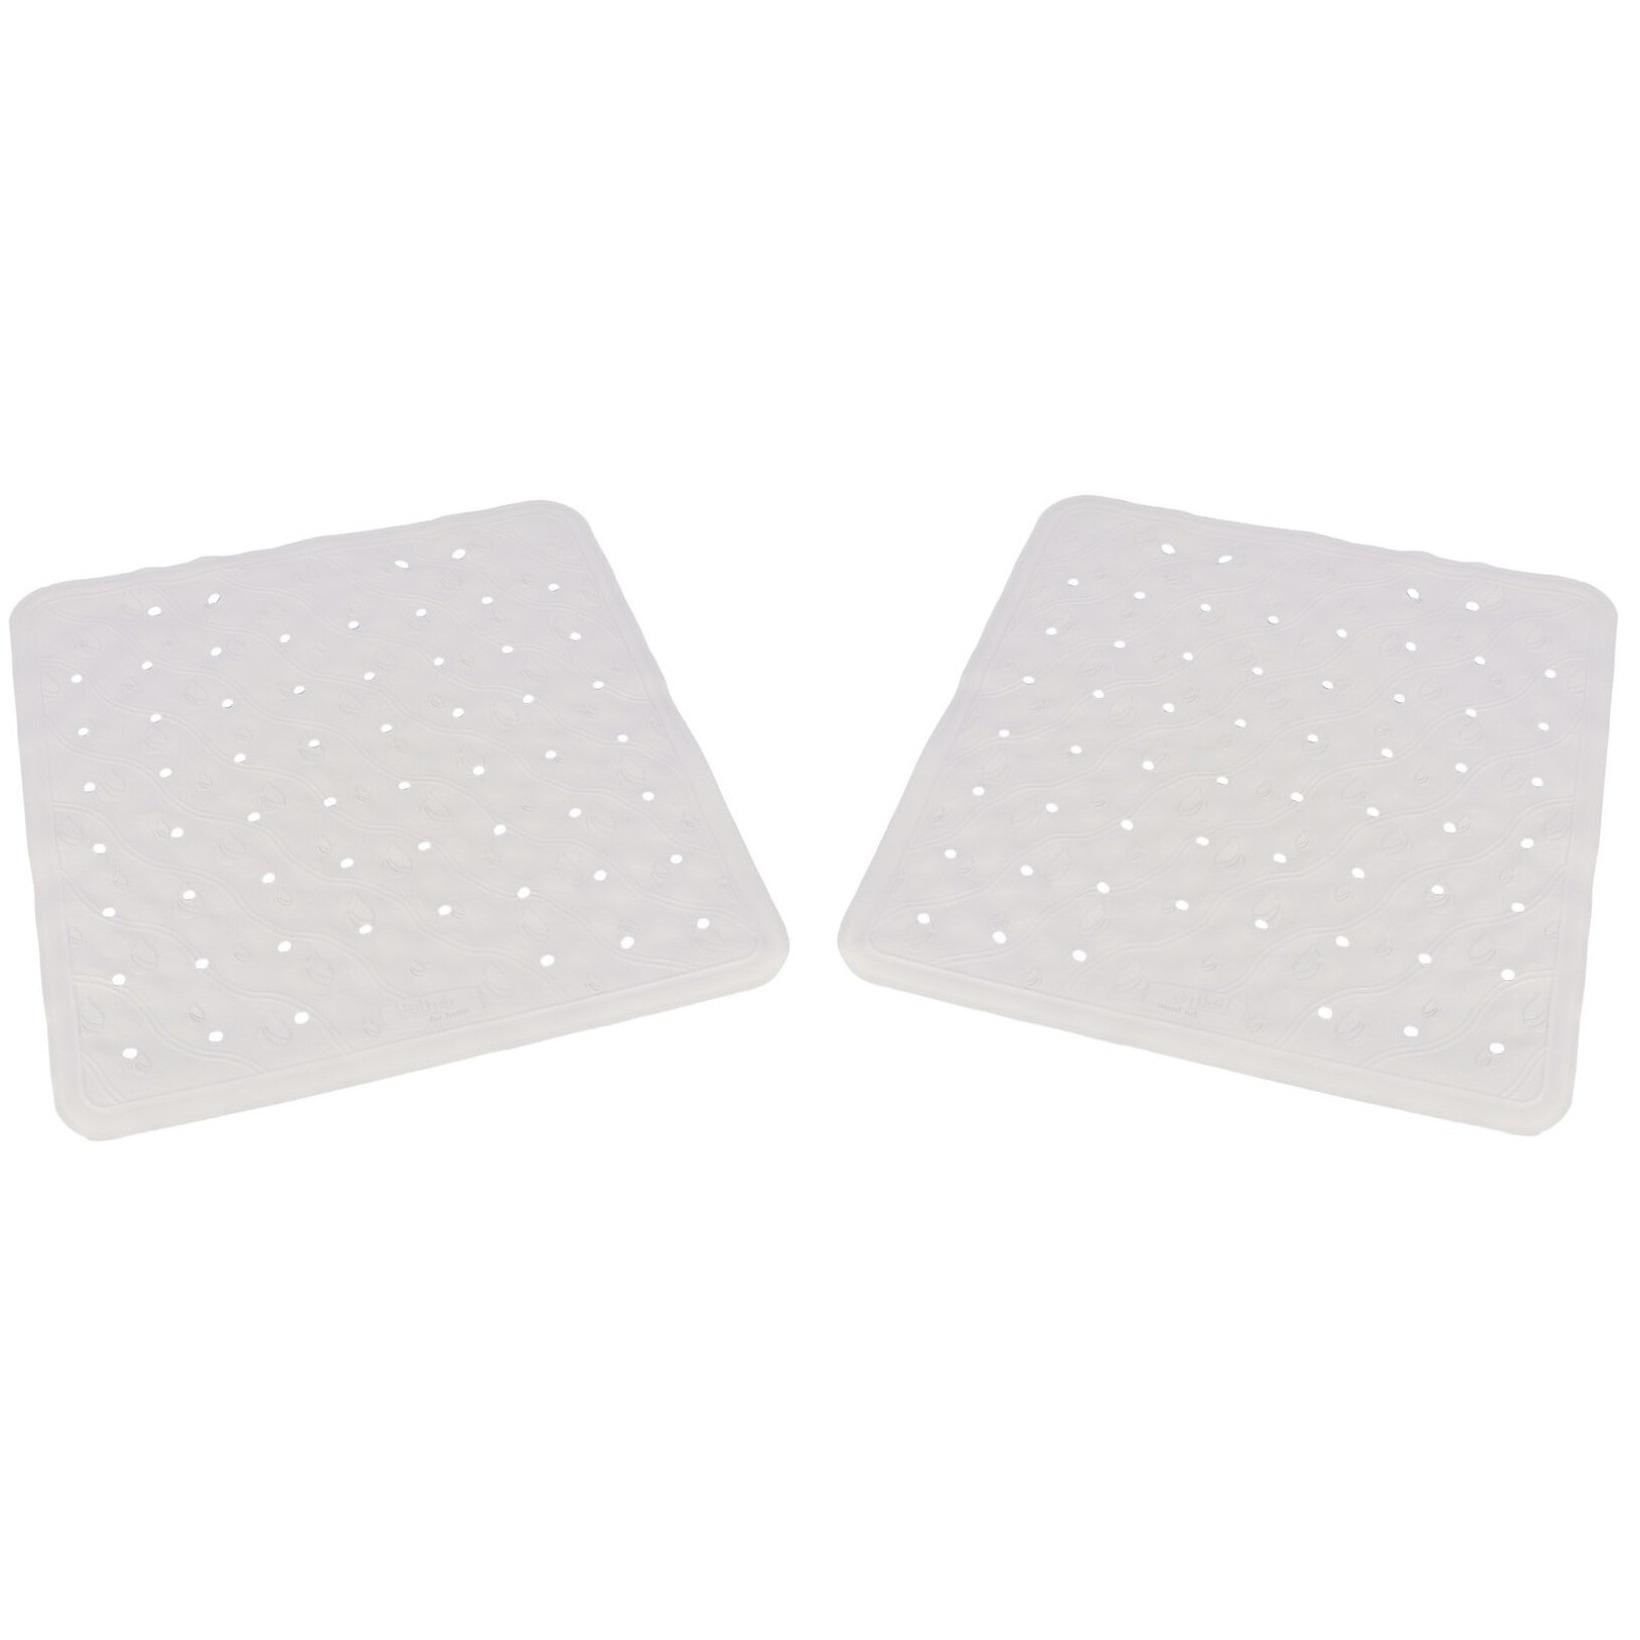 Set van 2x stuks witte anti-slip badmat-douchemat 54 x 54 cm vierkant